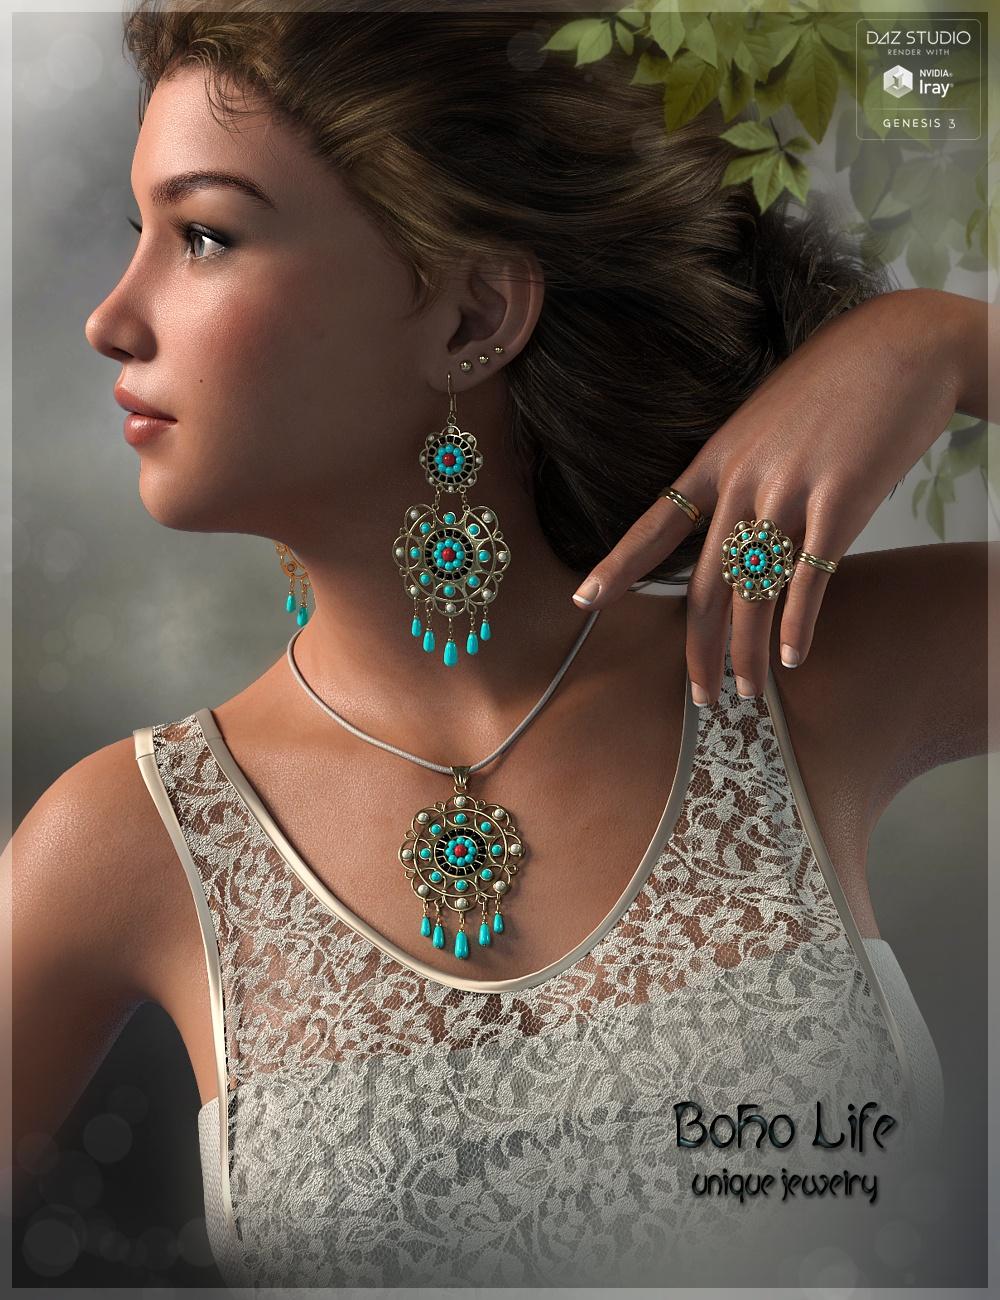 Boho Life Jewelry by: Fabiana, 3D Models by Daz 3D